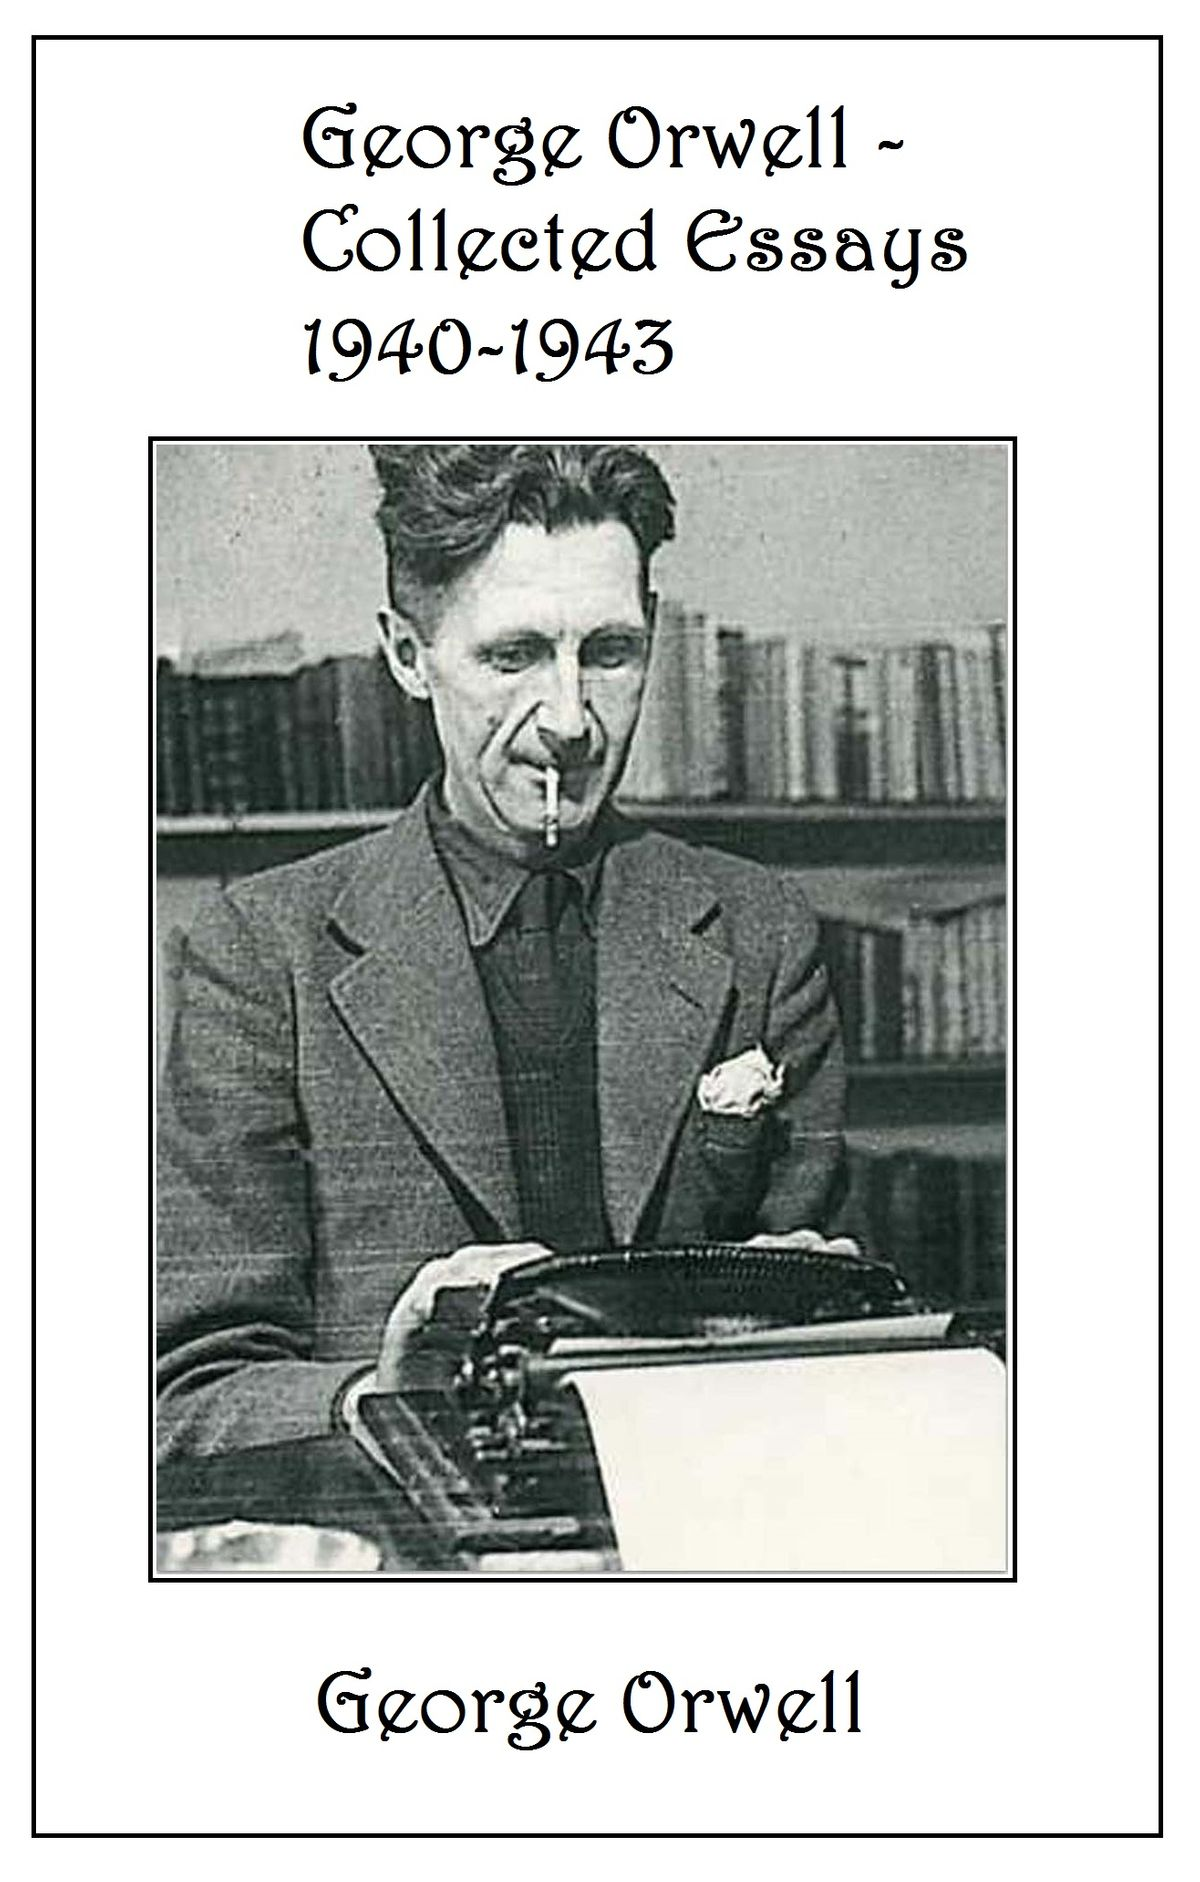 002 George Orwell Collected Essays Essay Frightening 1984 Summary Pdf On Writing Full